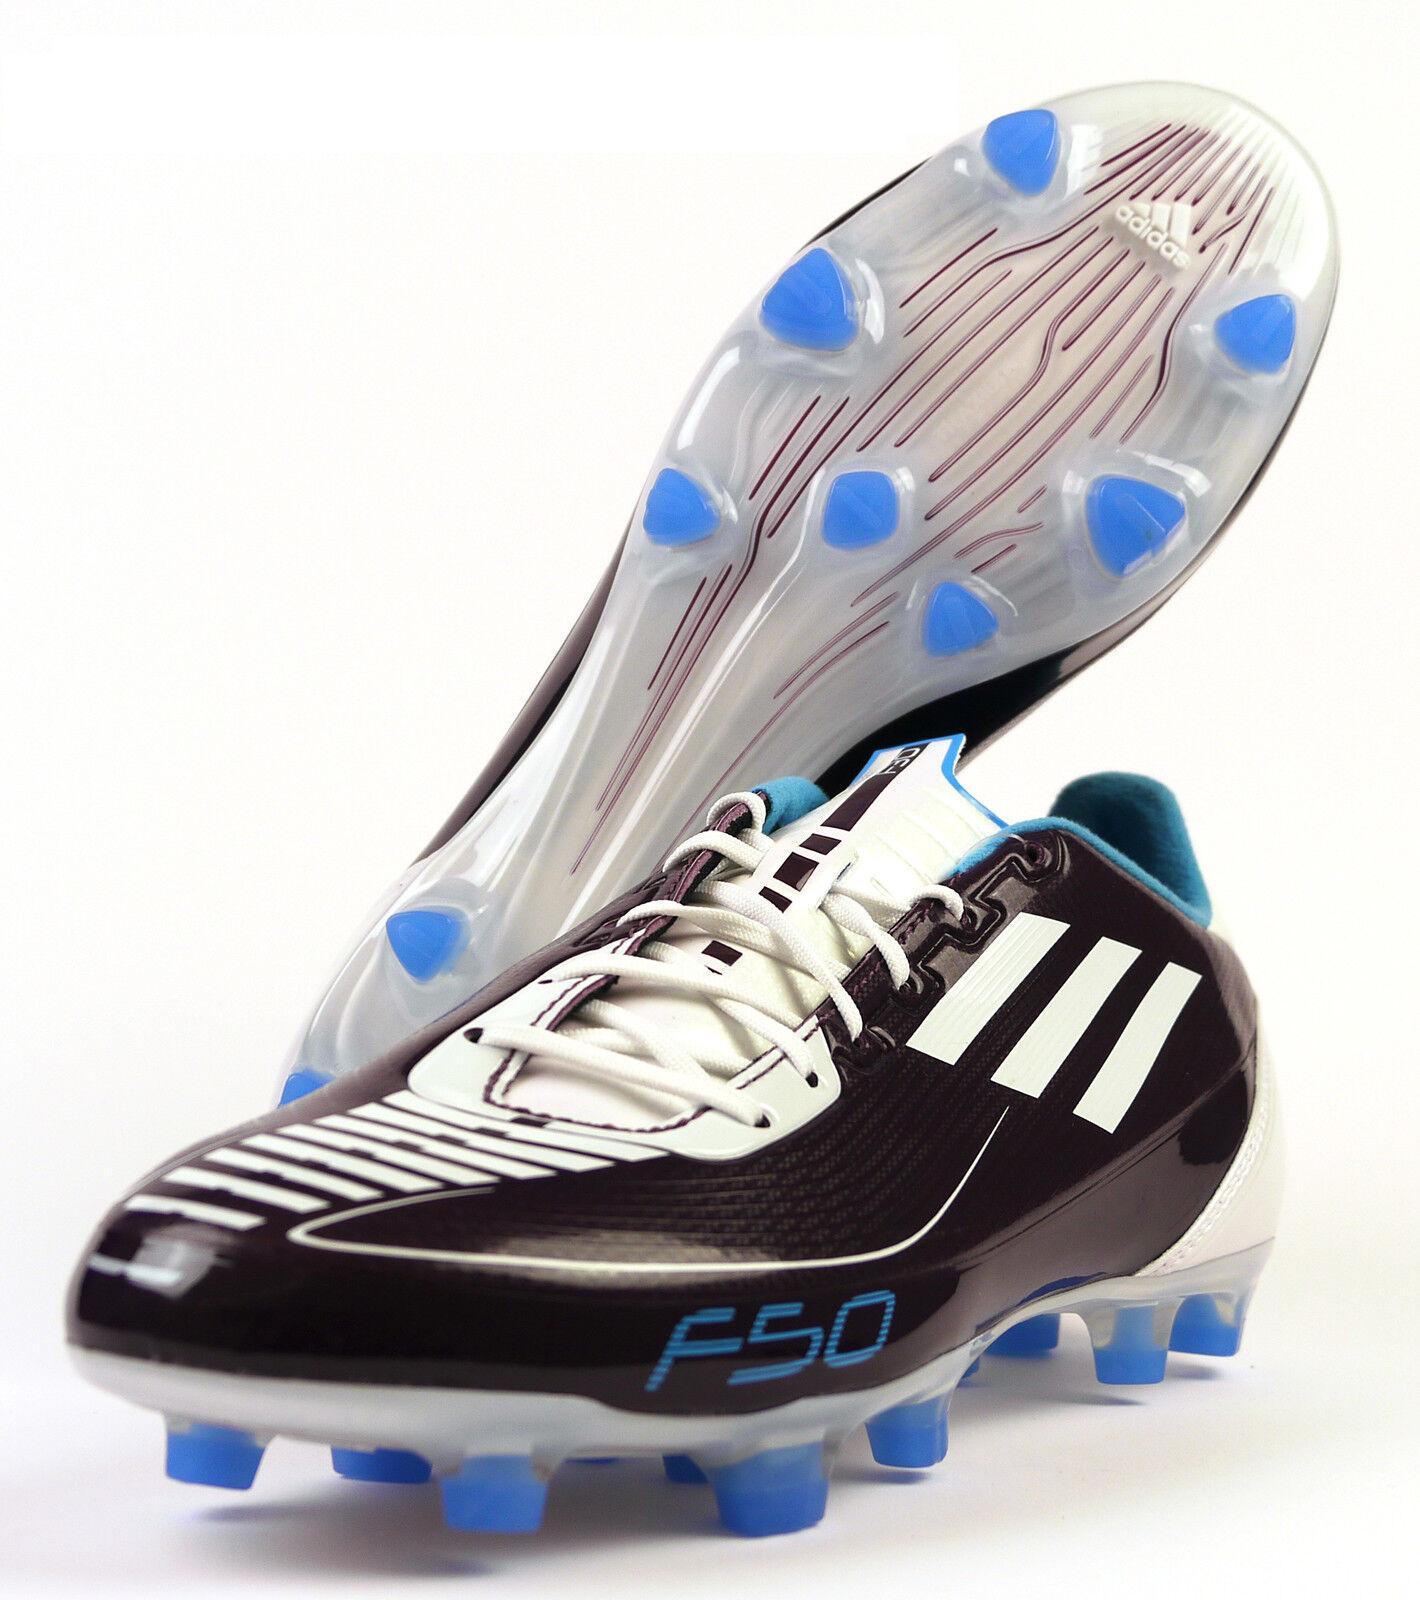 Adidas F30 TRX FG W Gr. 36 2 3 - 40 Damen Fußballschuh NEU OVP